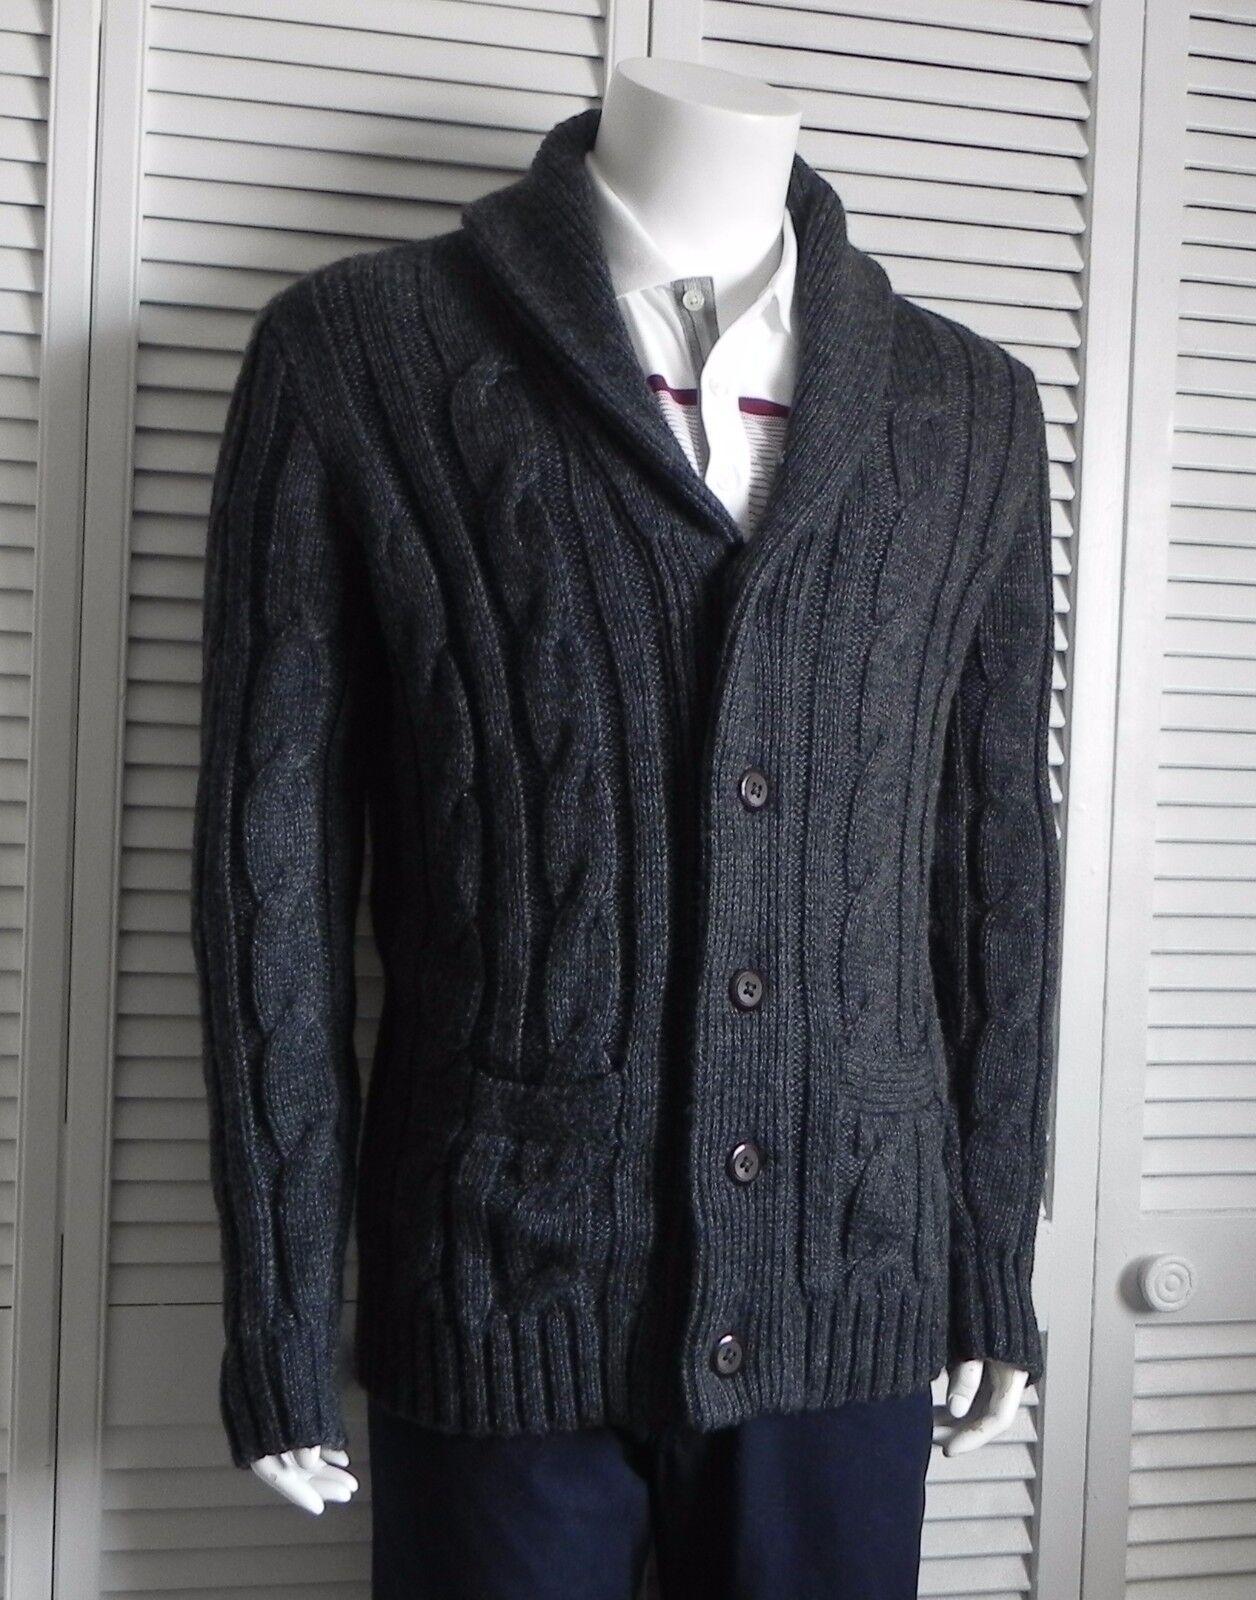 NEW  Herren SIZE XXXL 3XL ALPACA Dark grau Knit Cable Shawl Collar Cardigan Sweater